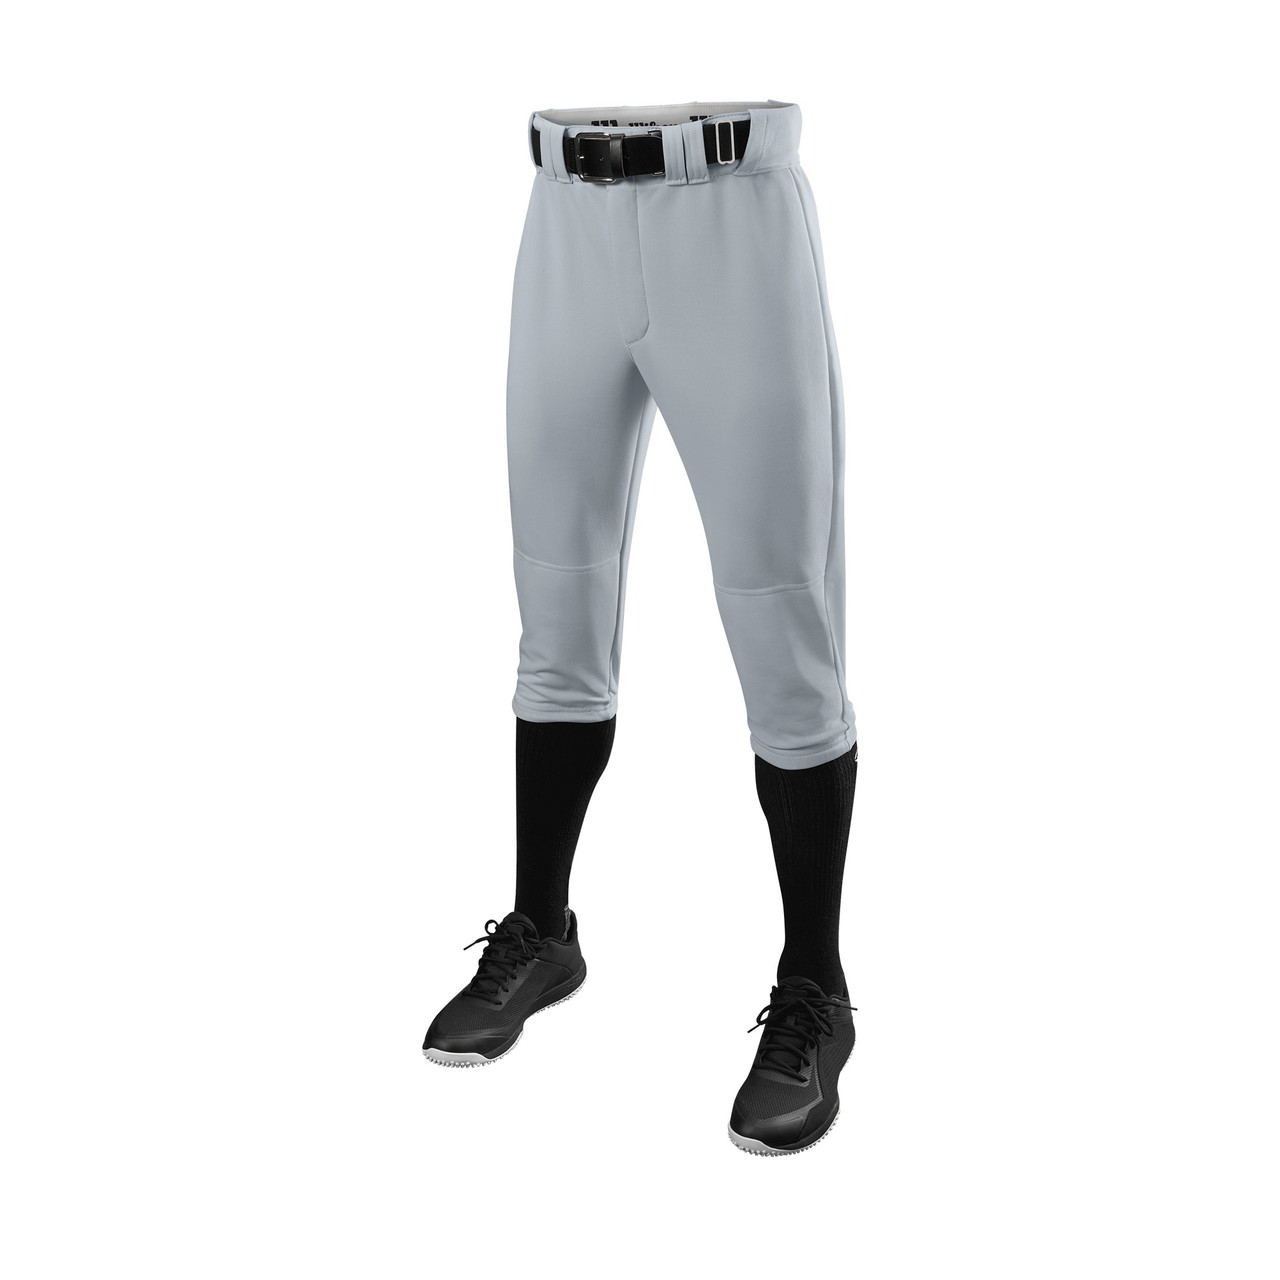 Wilson Youth Knicker P203K Baseball Pant